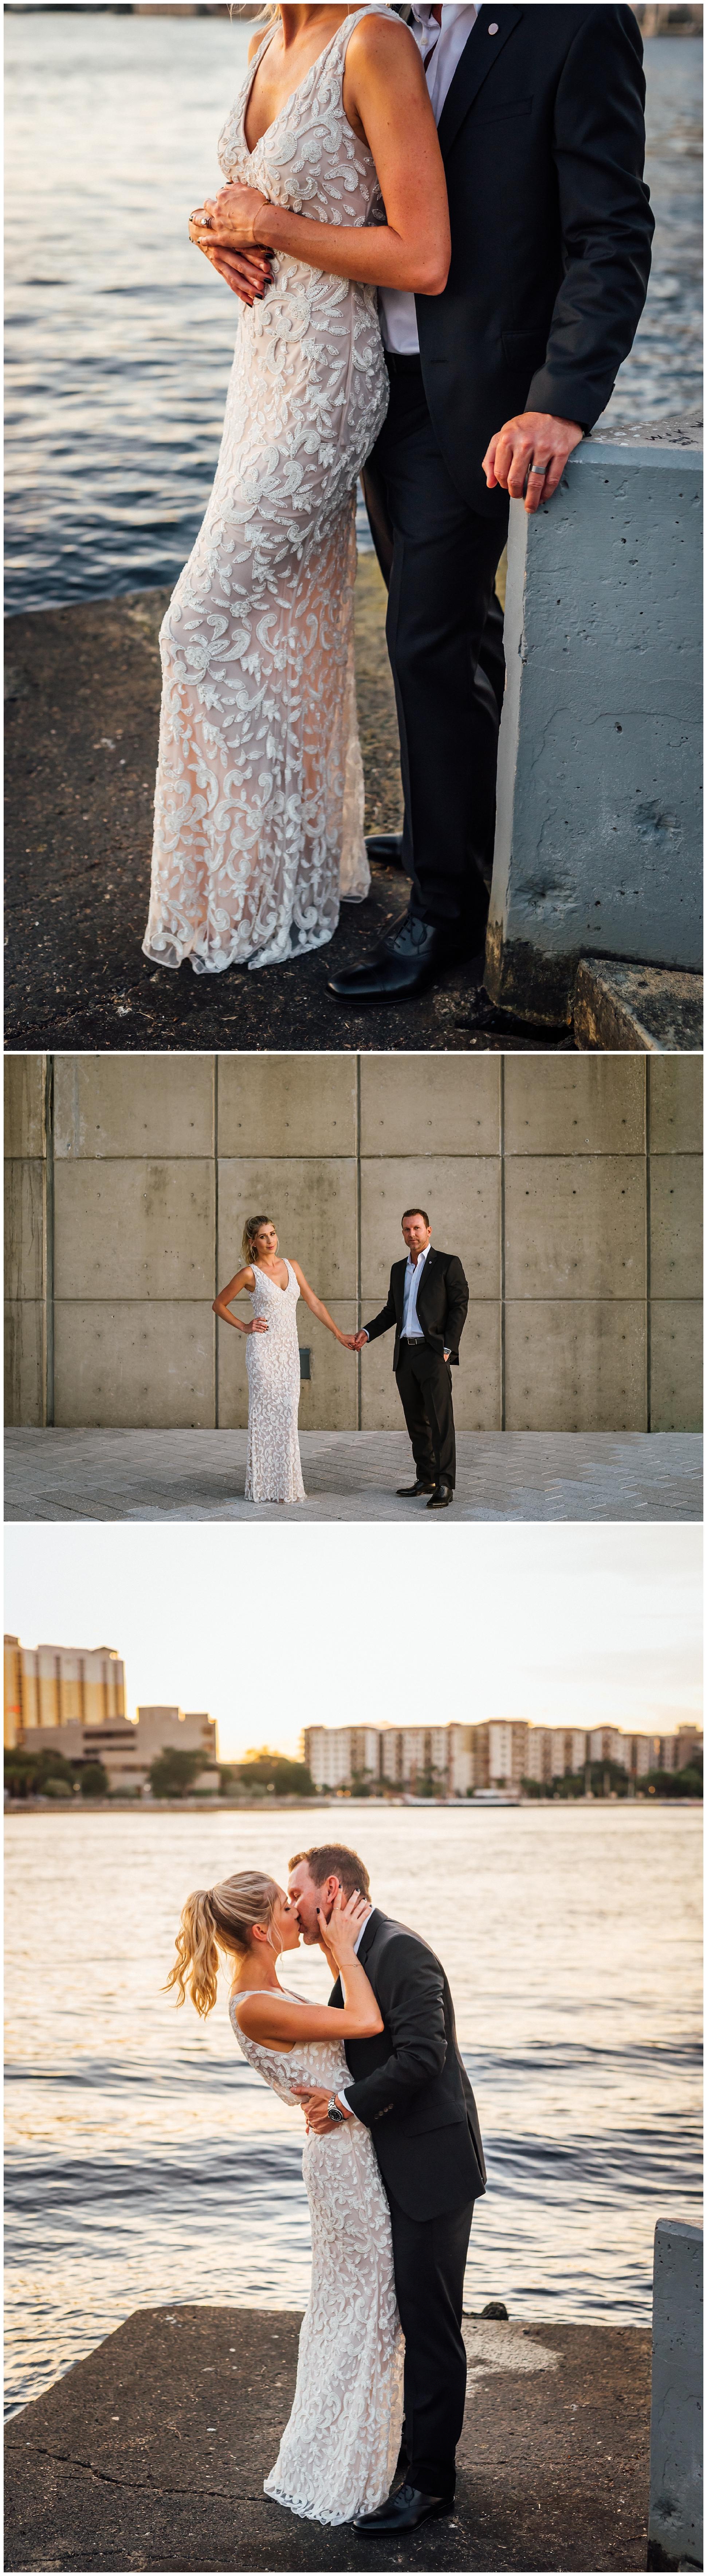 Ashlee-hamon-photography-year-in-review-2016-travel-wanderlust-vsco-adventure-wedding_0097.jpg